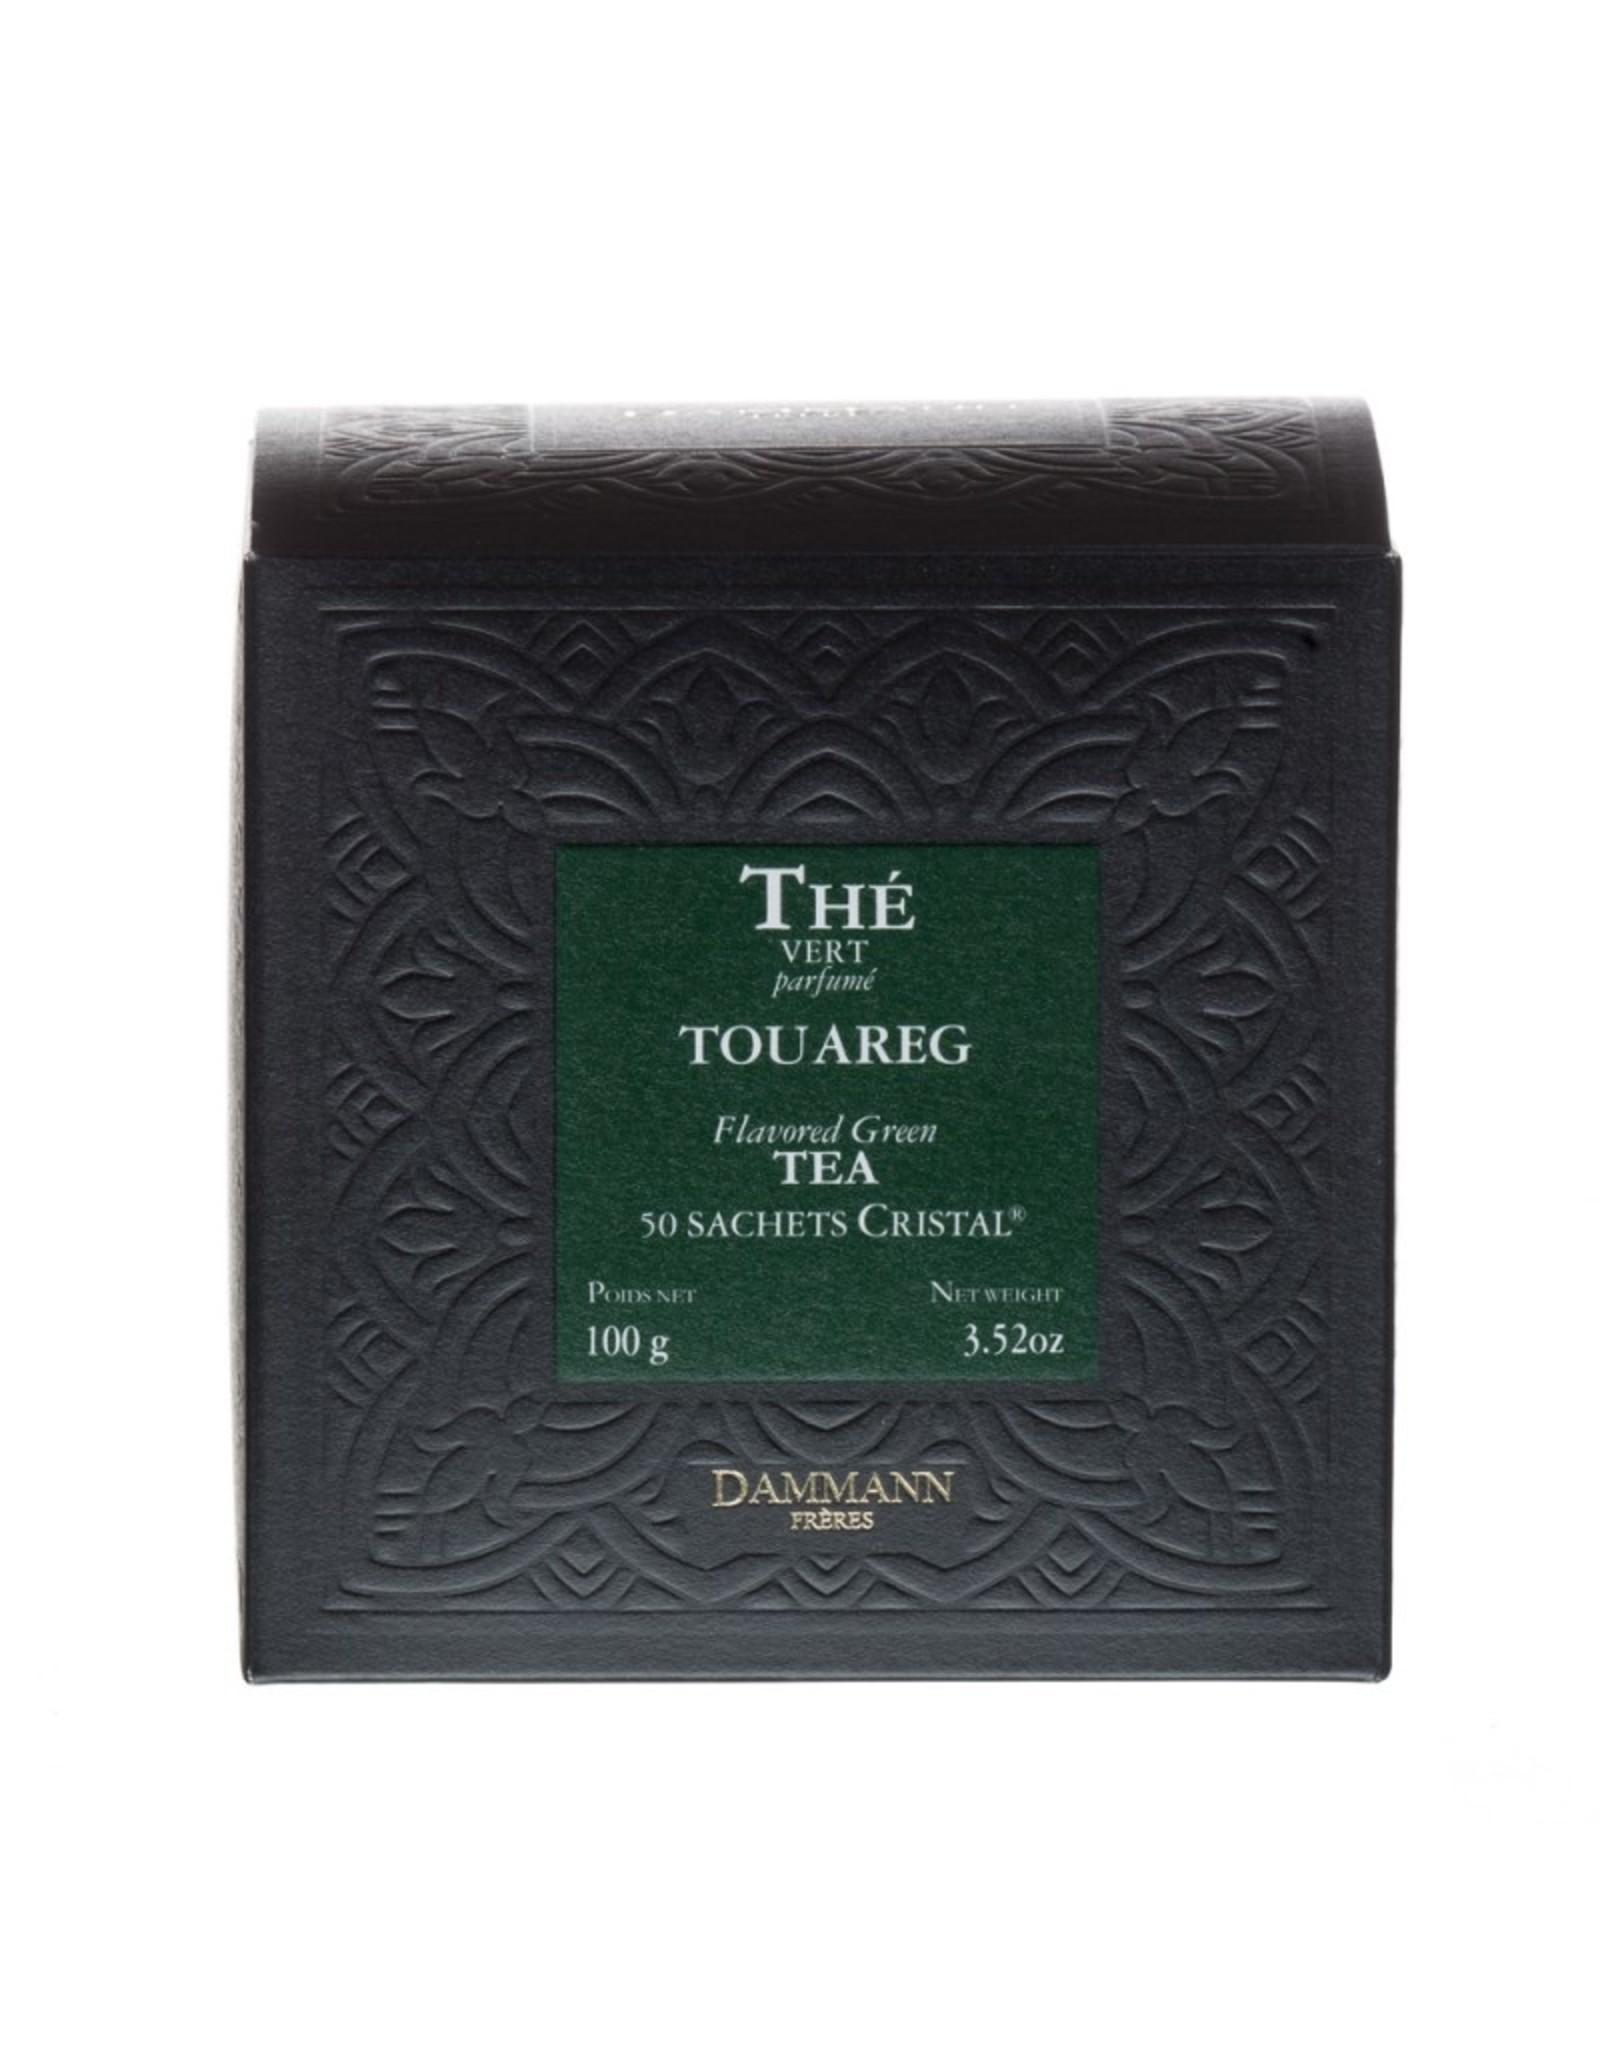 Dammann 'Touareg' Flavoured Green tea